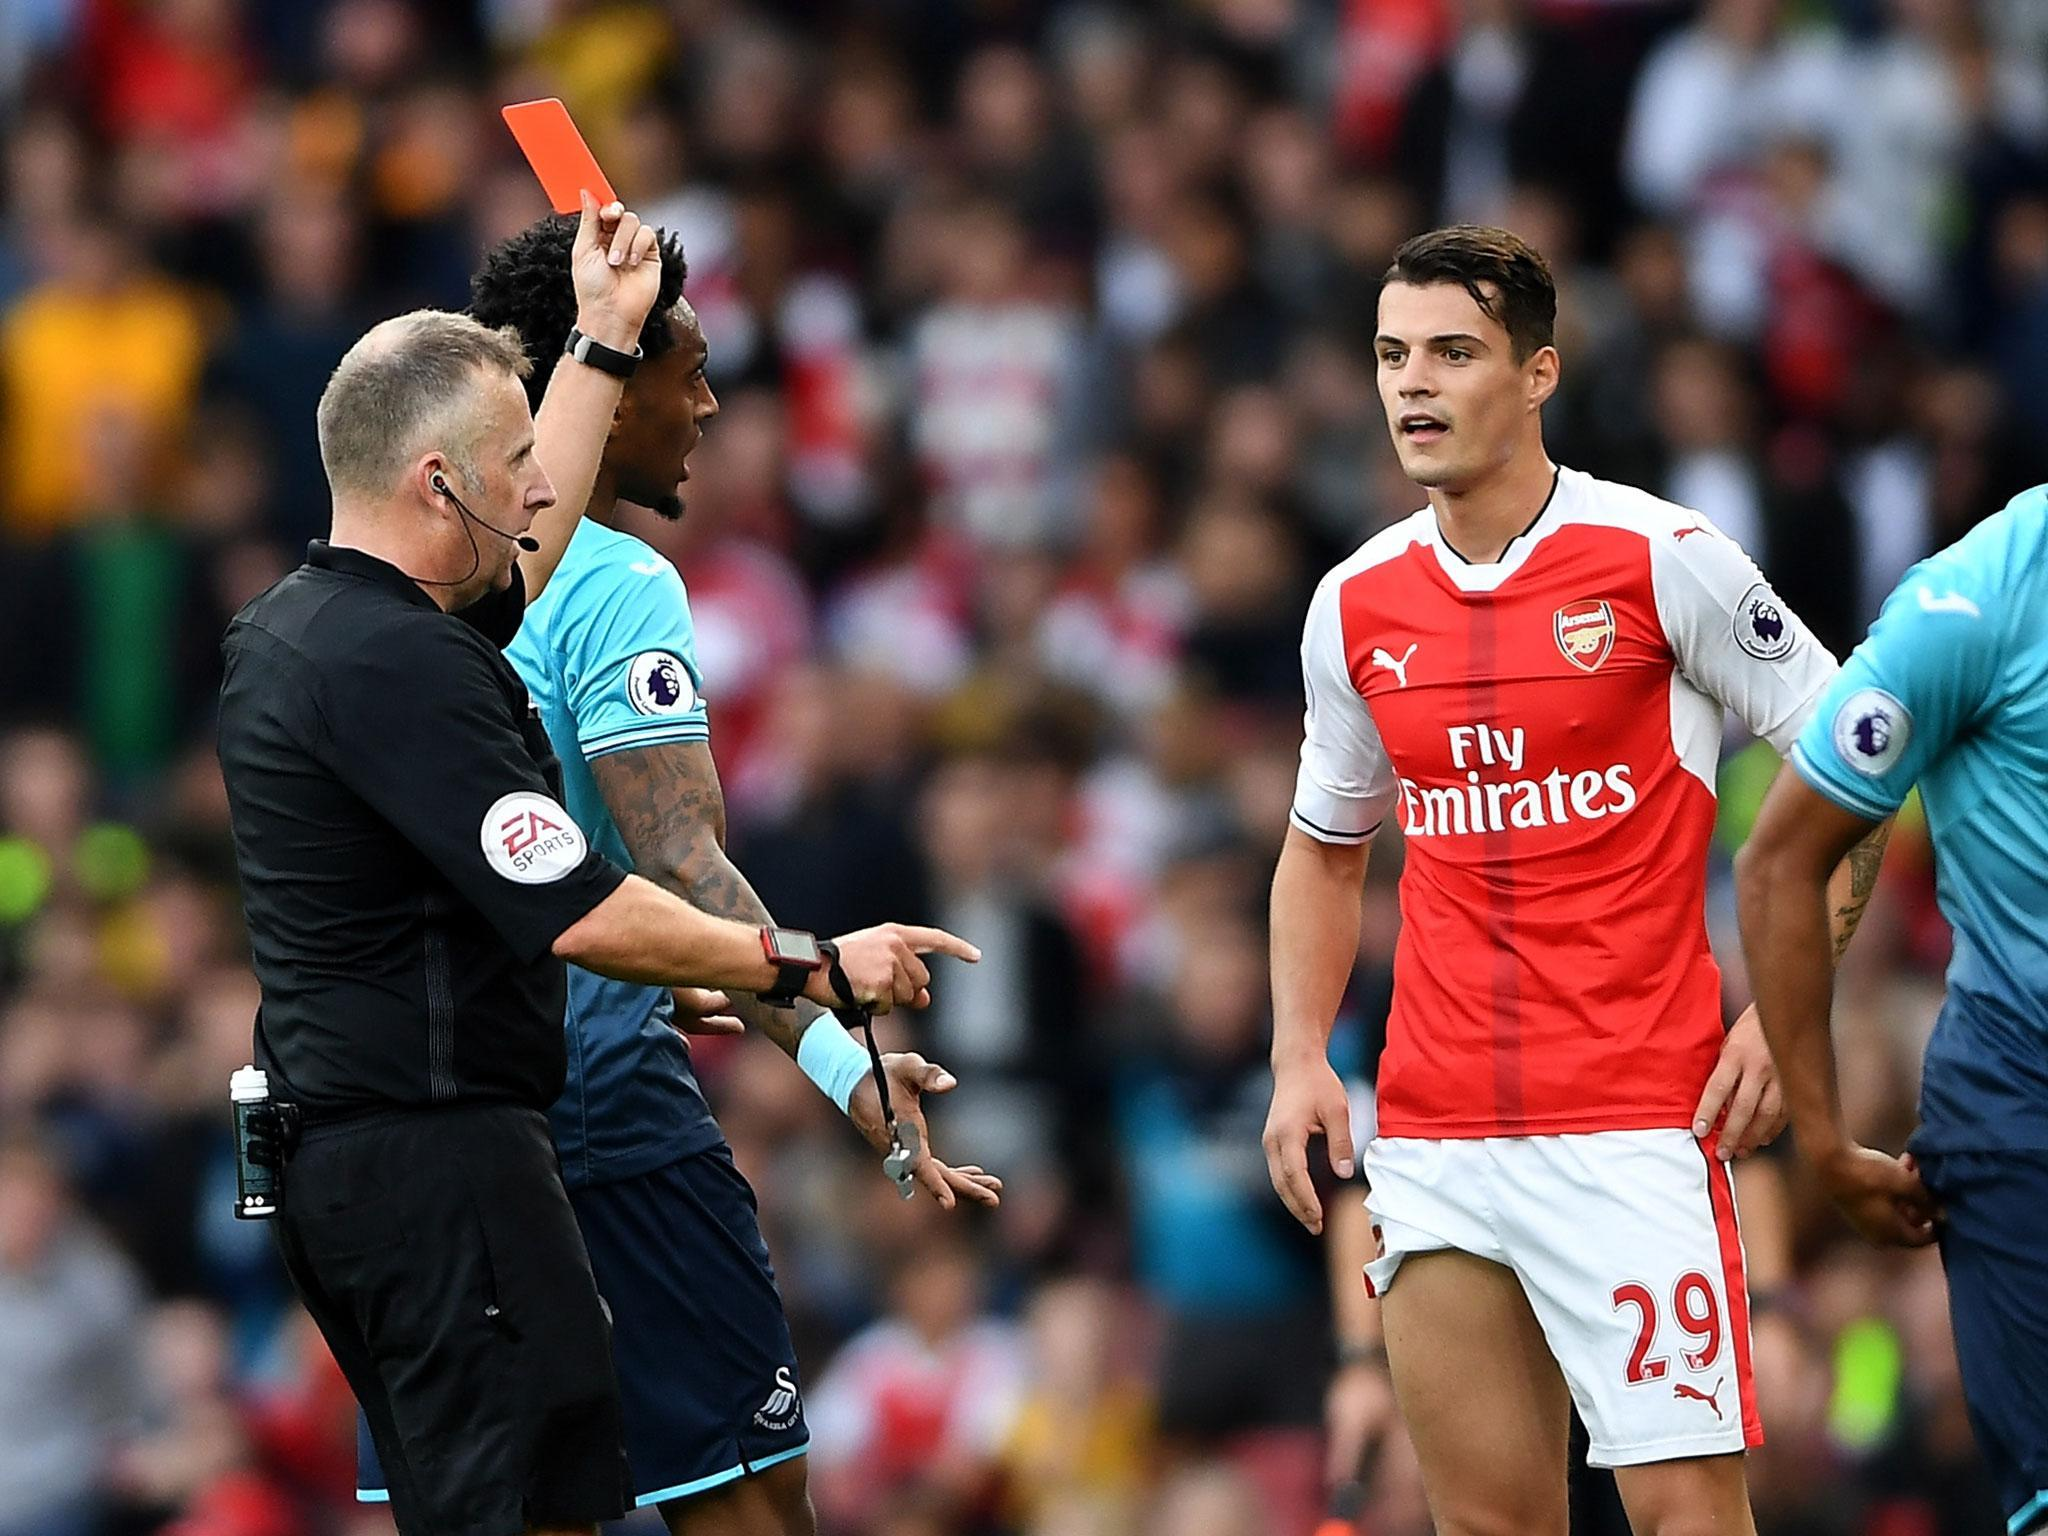 Arsenal s Granit Xhaka won t curb his aggressive style despite